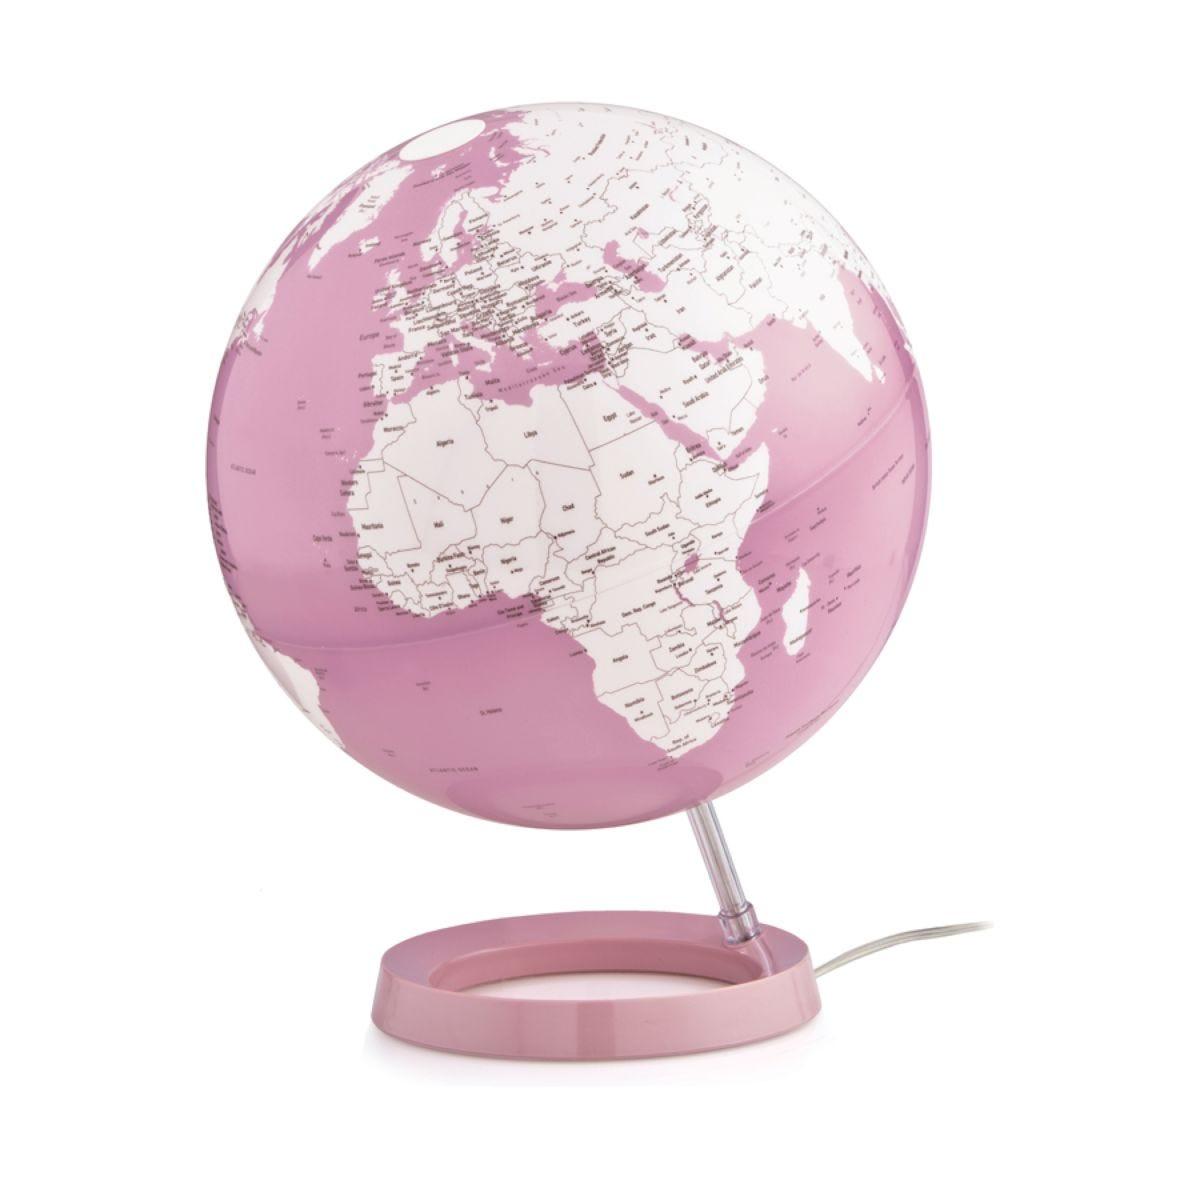 Atmosphere 30cm Illuminated Globe - Bright Coral